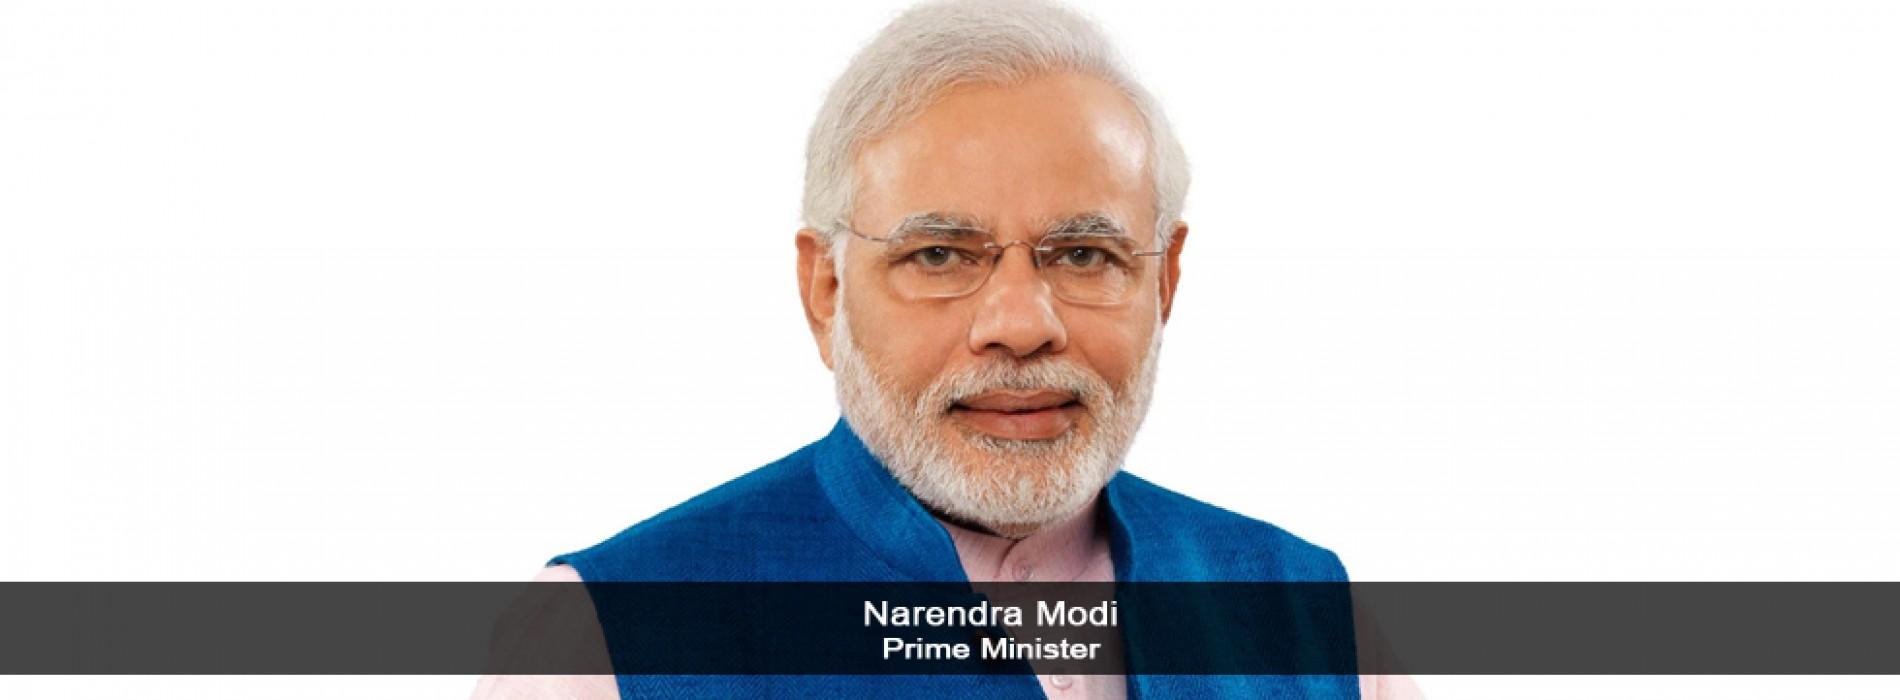 At Niti Aayog meet, PM Modi analyzes budget, skills, tourism